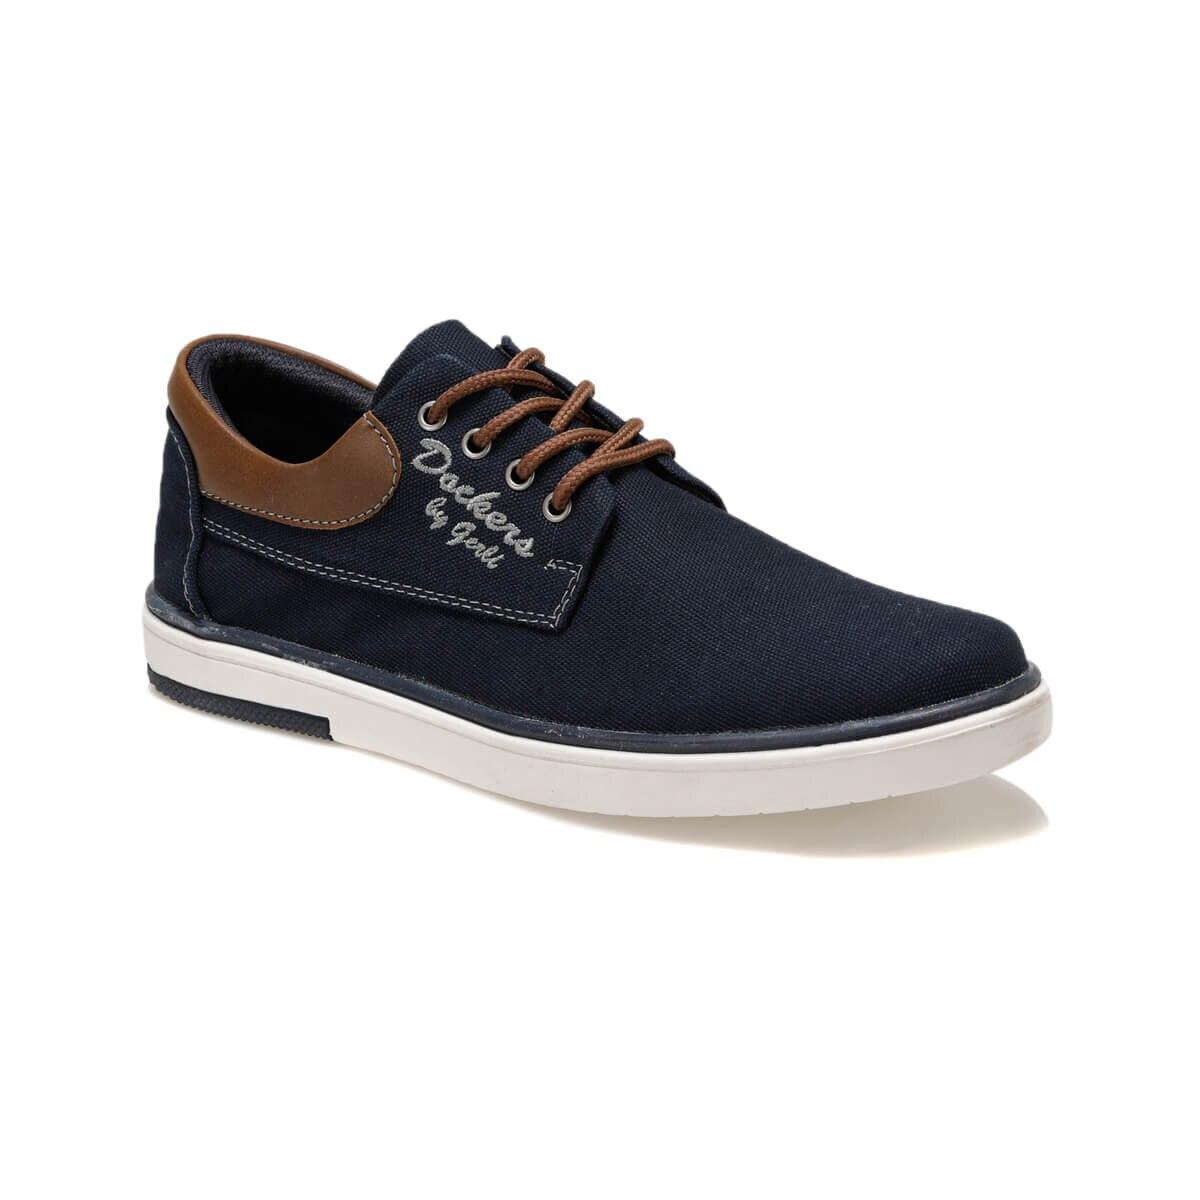 FLO 224942 Navy Blue Men 'S Sneaker Shoes By Dockers The Gerle